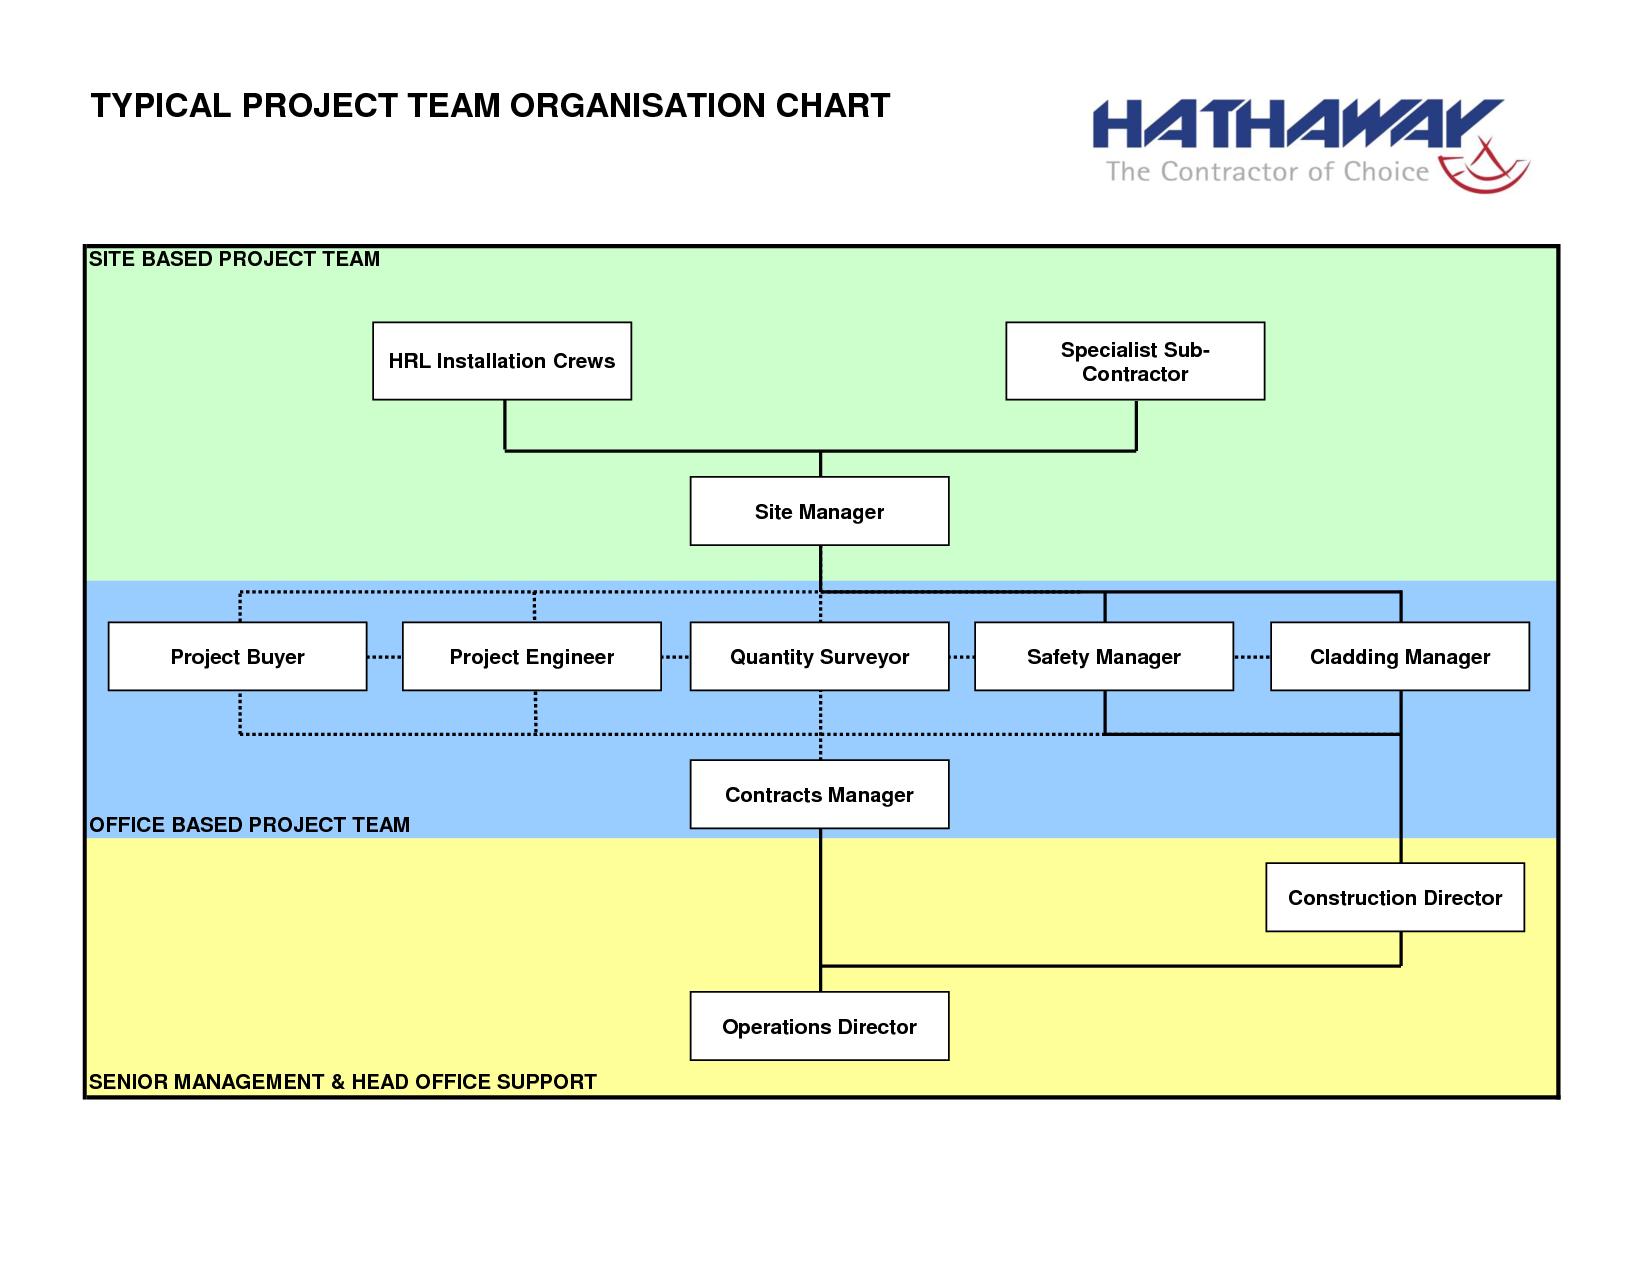 Construction organizational chart template project management organisation also rh pinterest